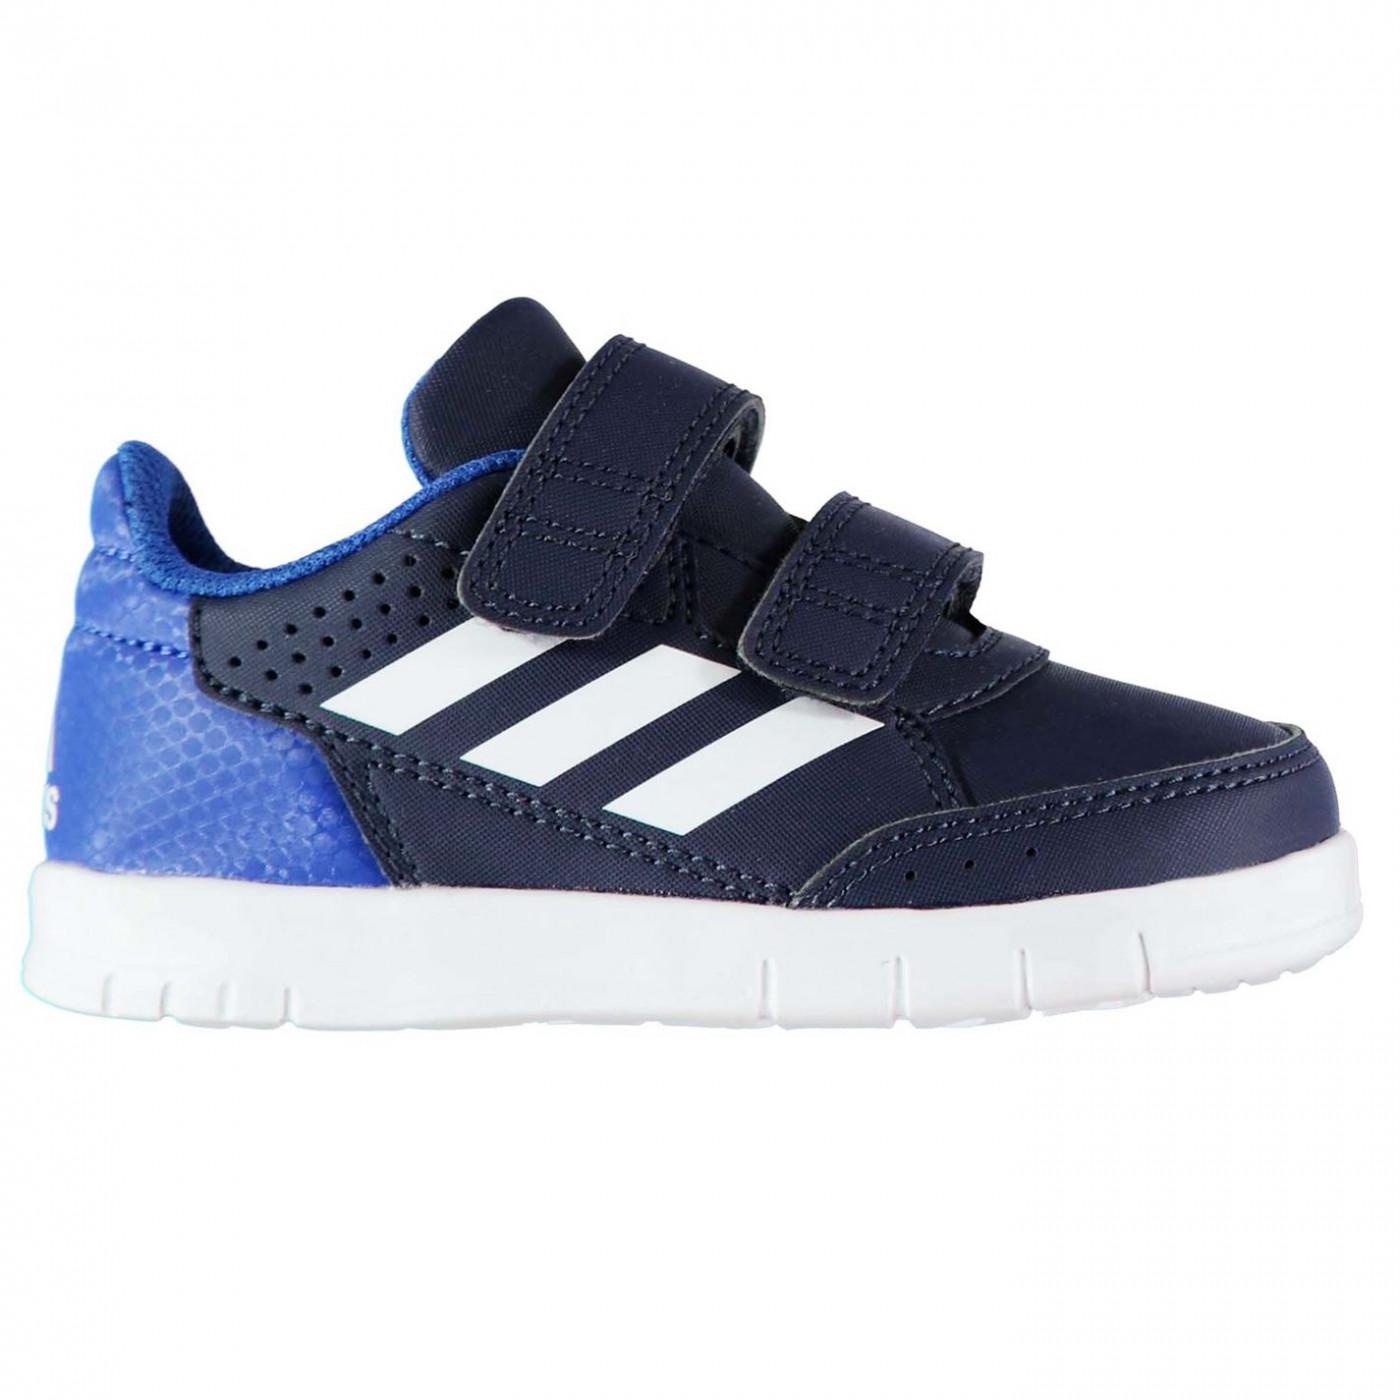 Adidas AltaSport CF Trainers Infants